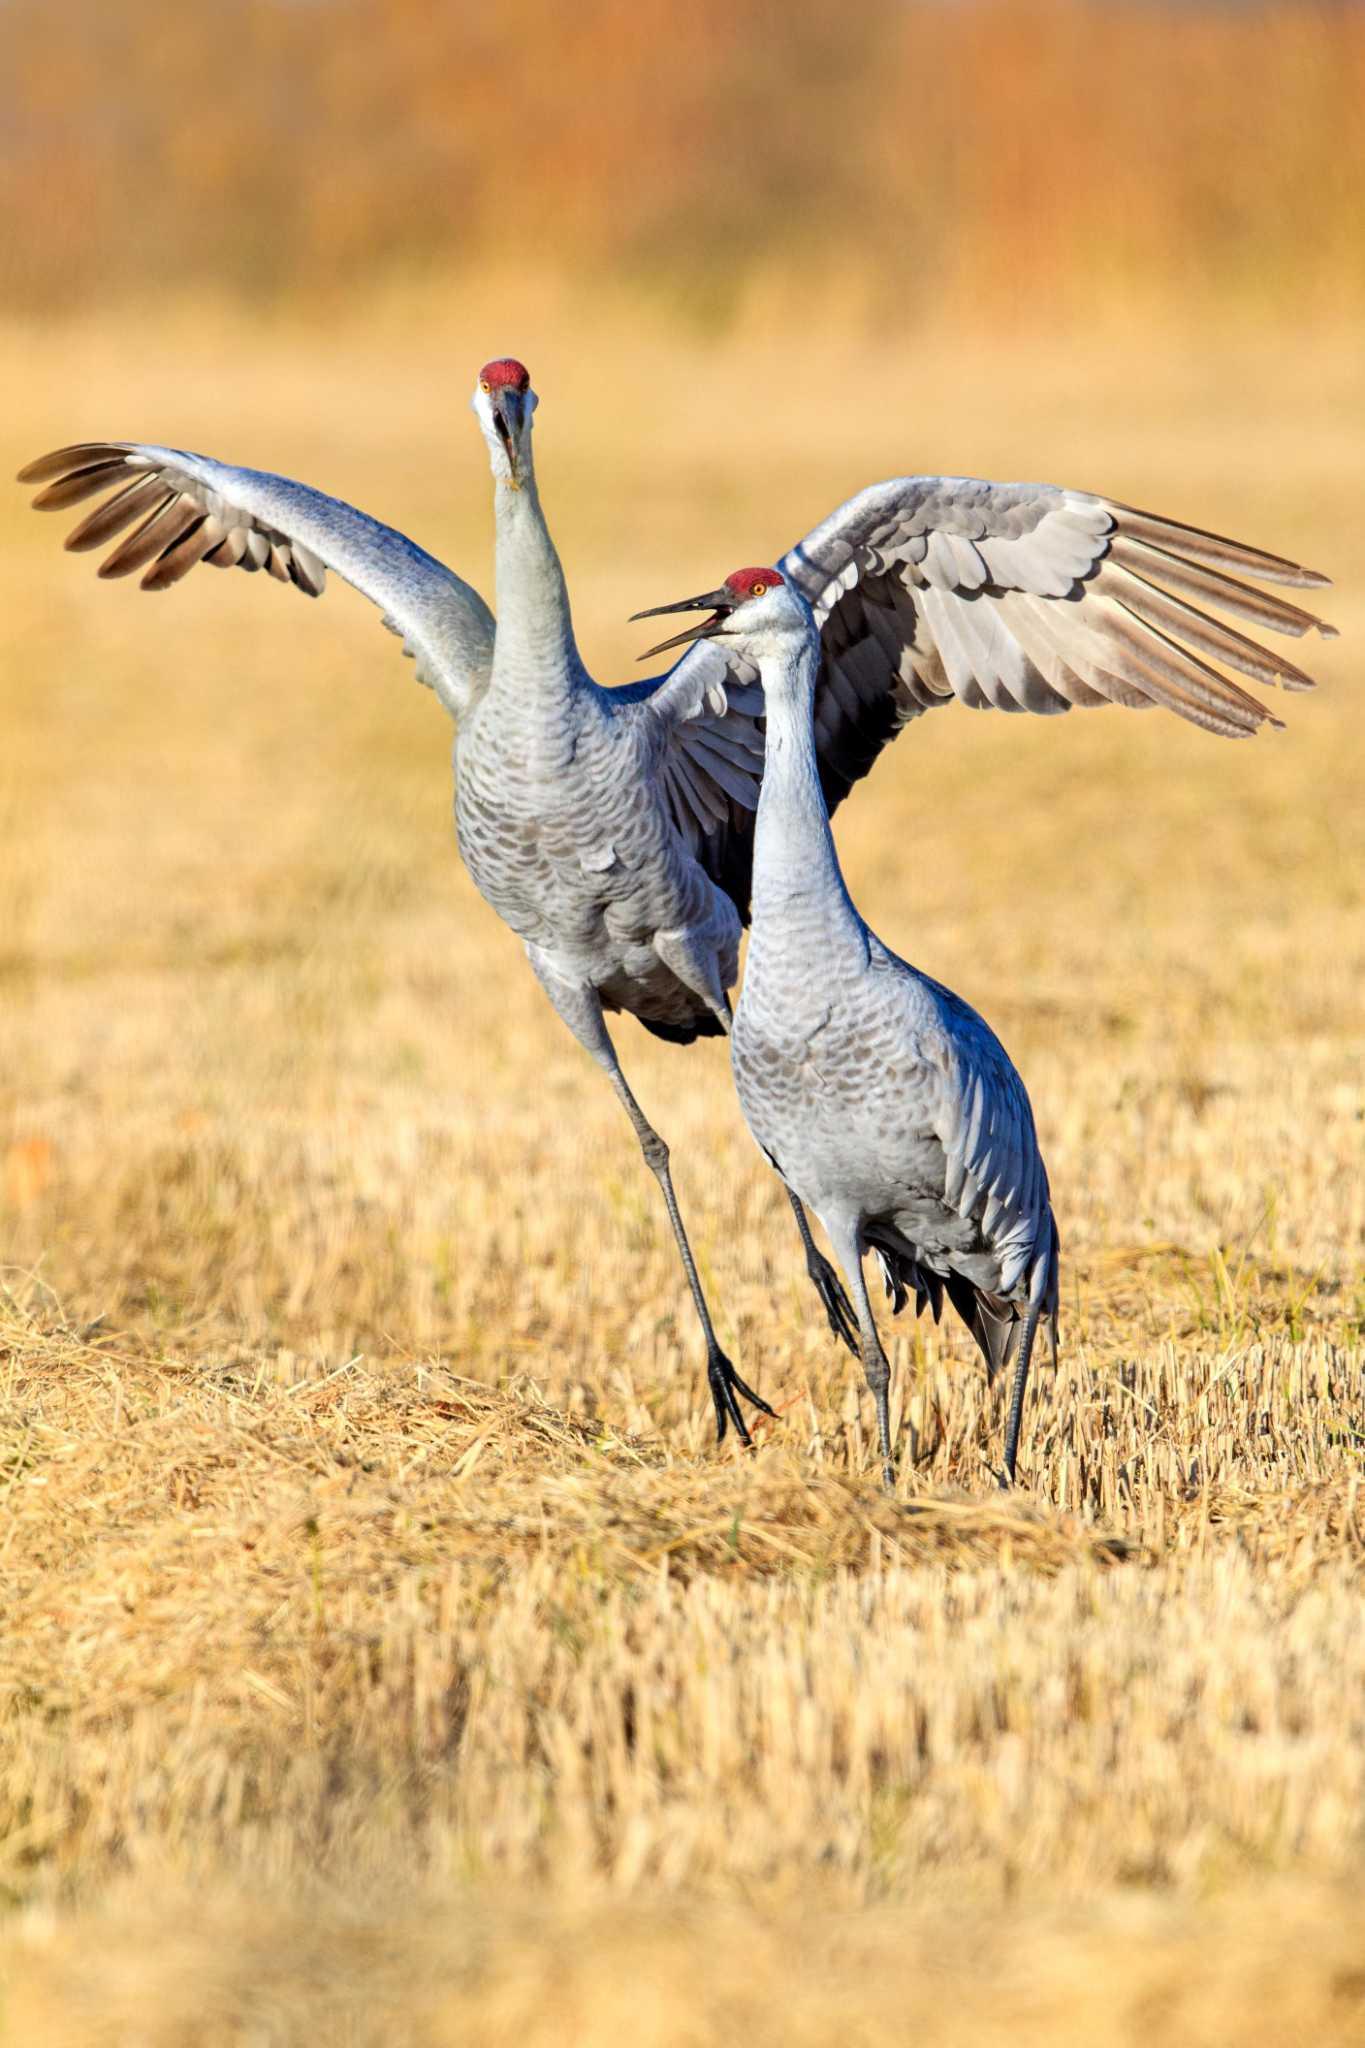 Drama In World Of Birds Sandhill Crane >> Birdwatchers Flock To Lodi For Majestic Sandhill Cranes